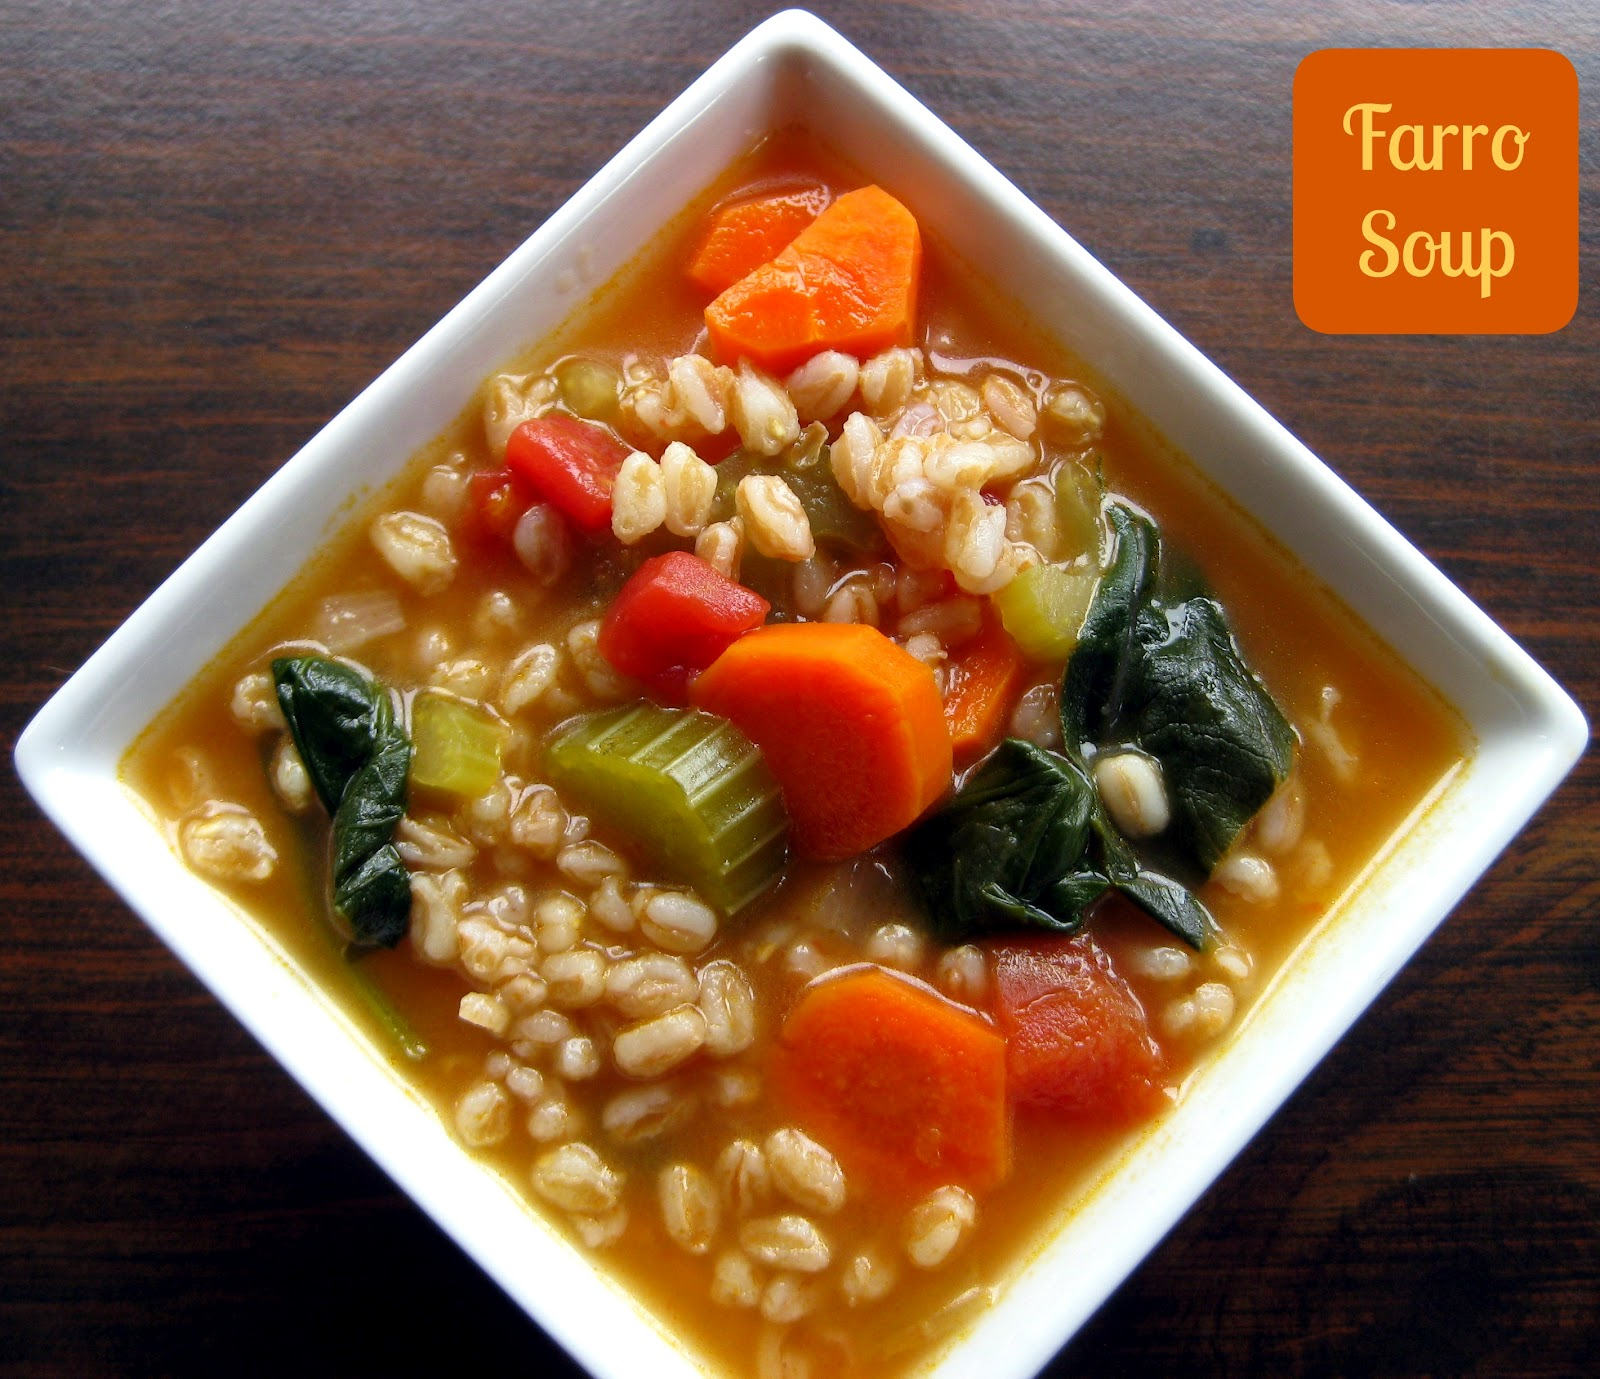 Karis' Kitchen | A Vegetarian Food Blog: Farro Soup